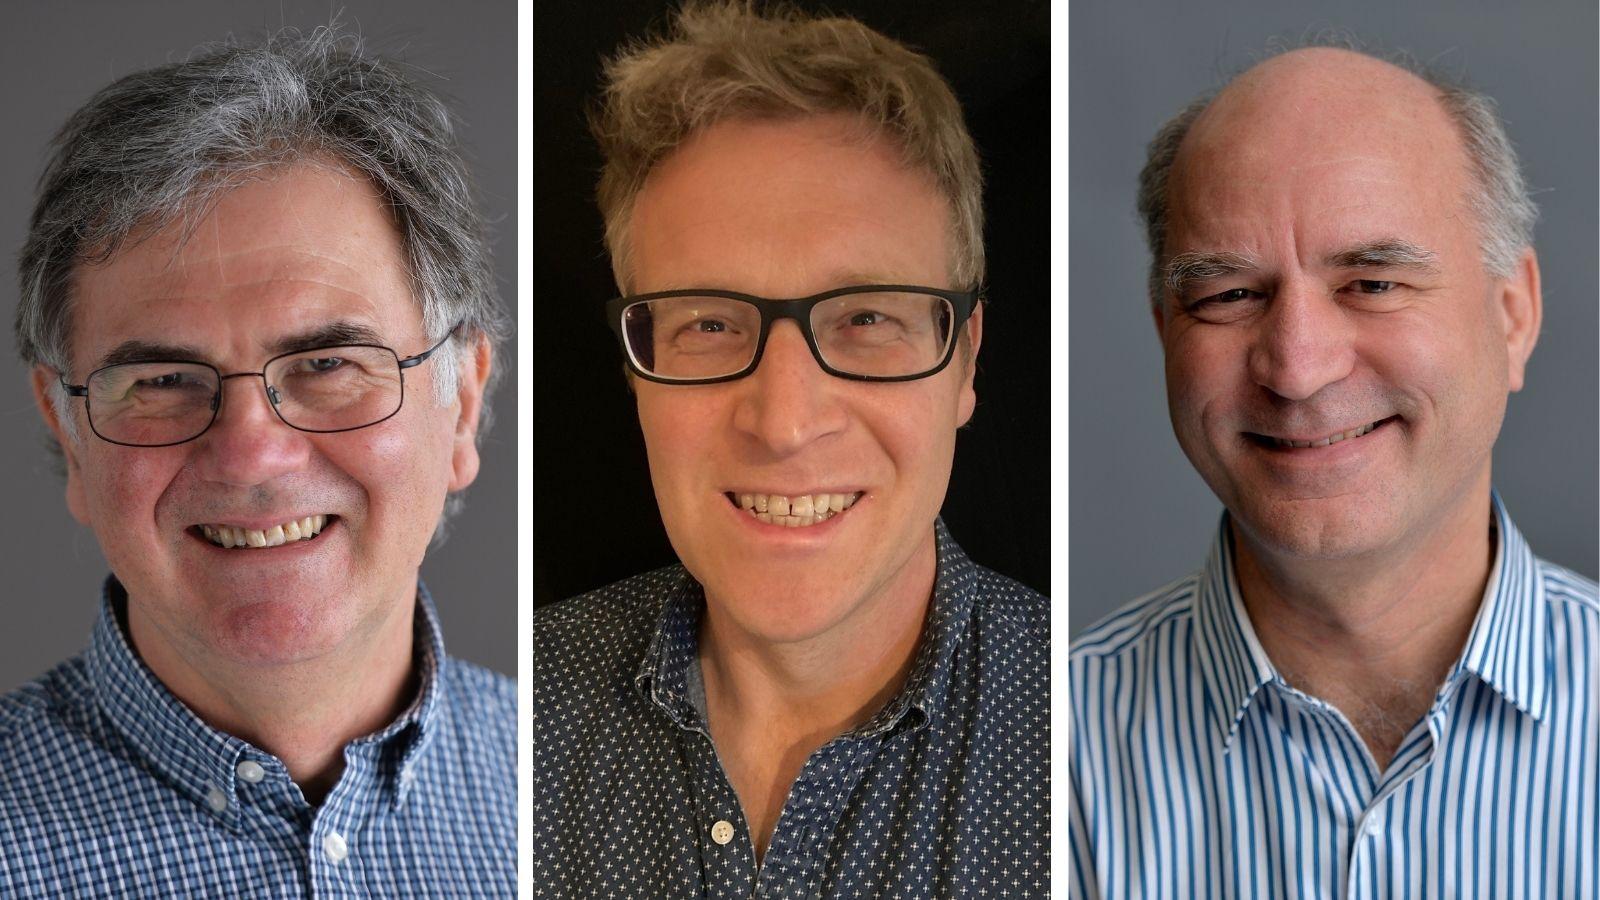 Mark Lansdown, William Gray and Jamie Day